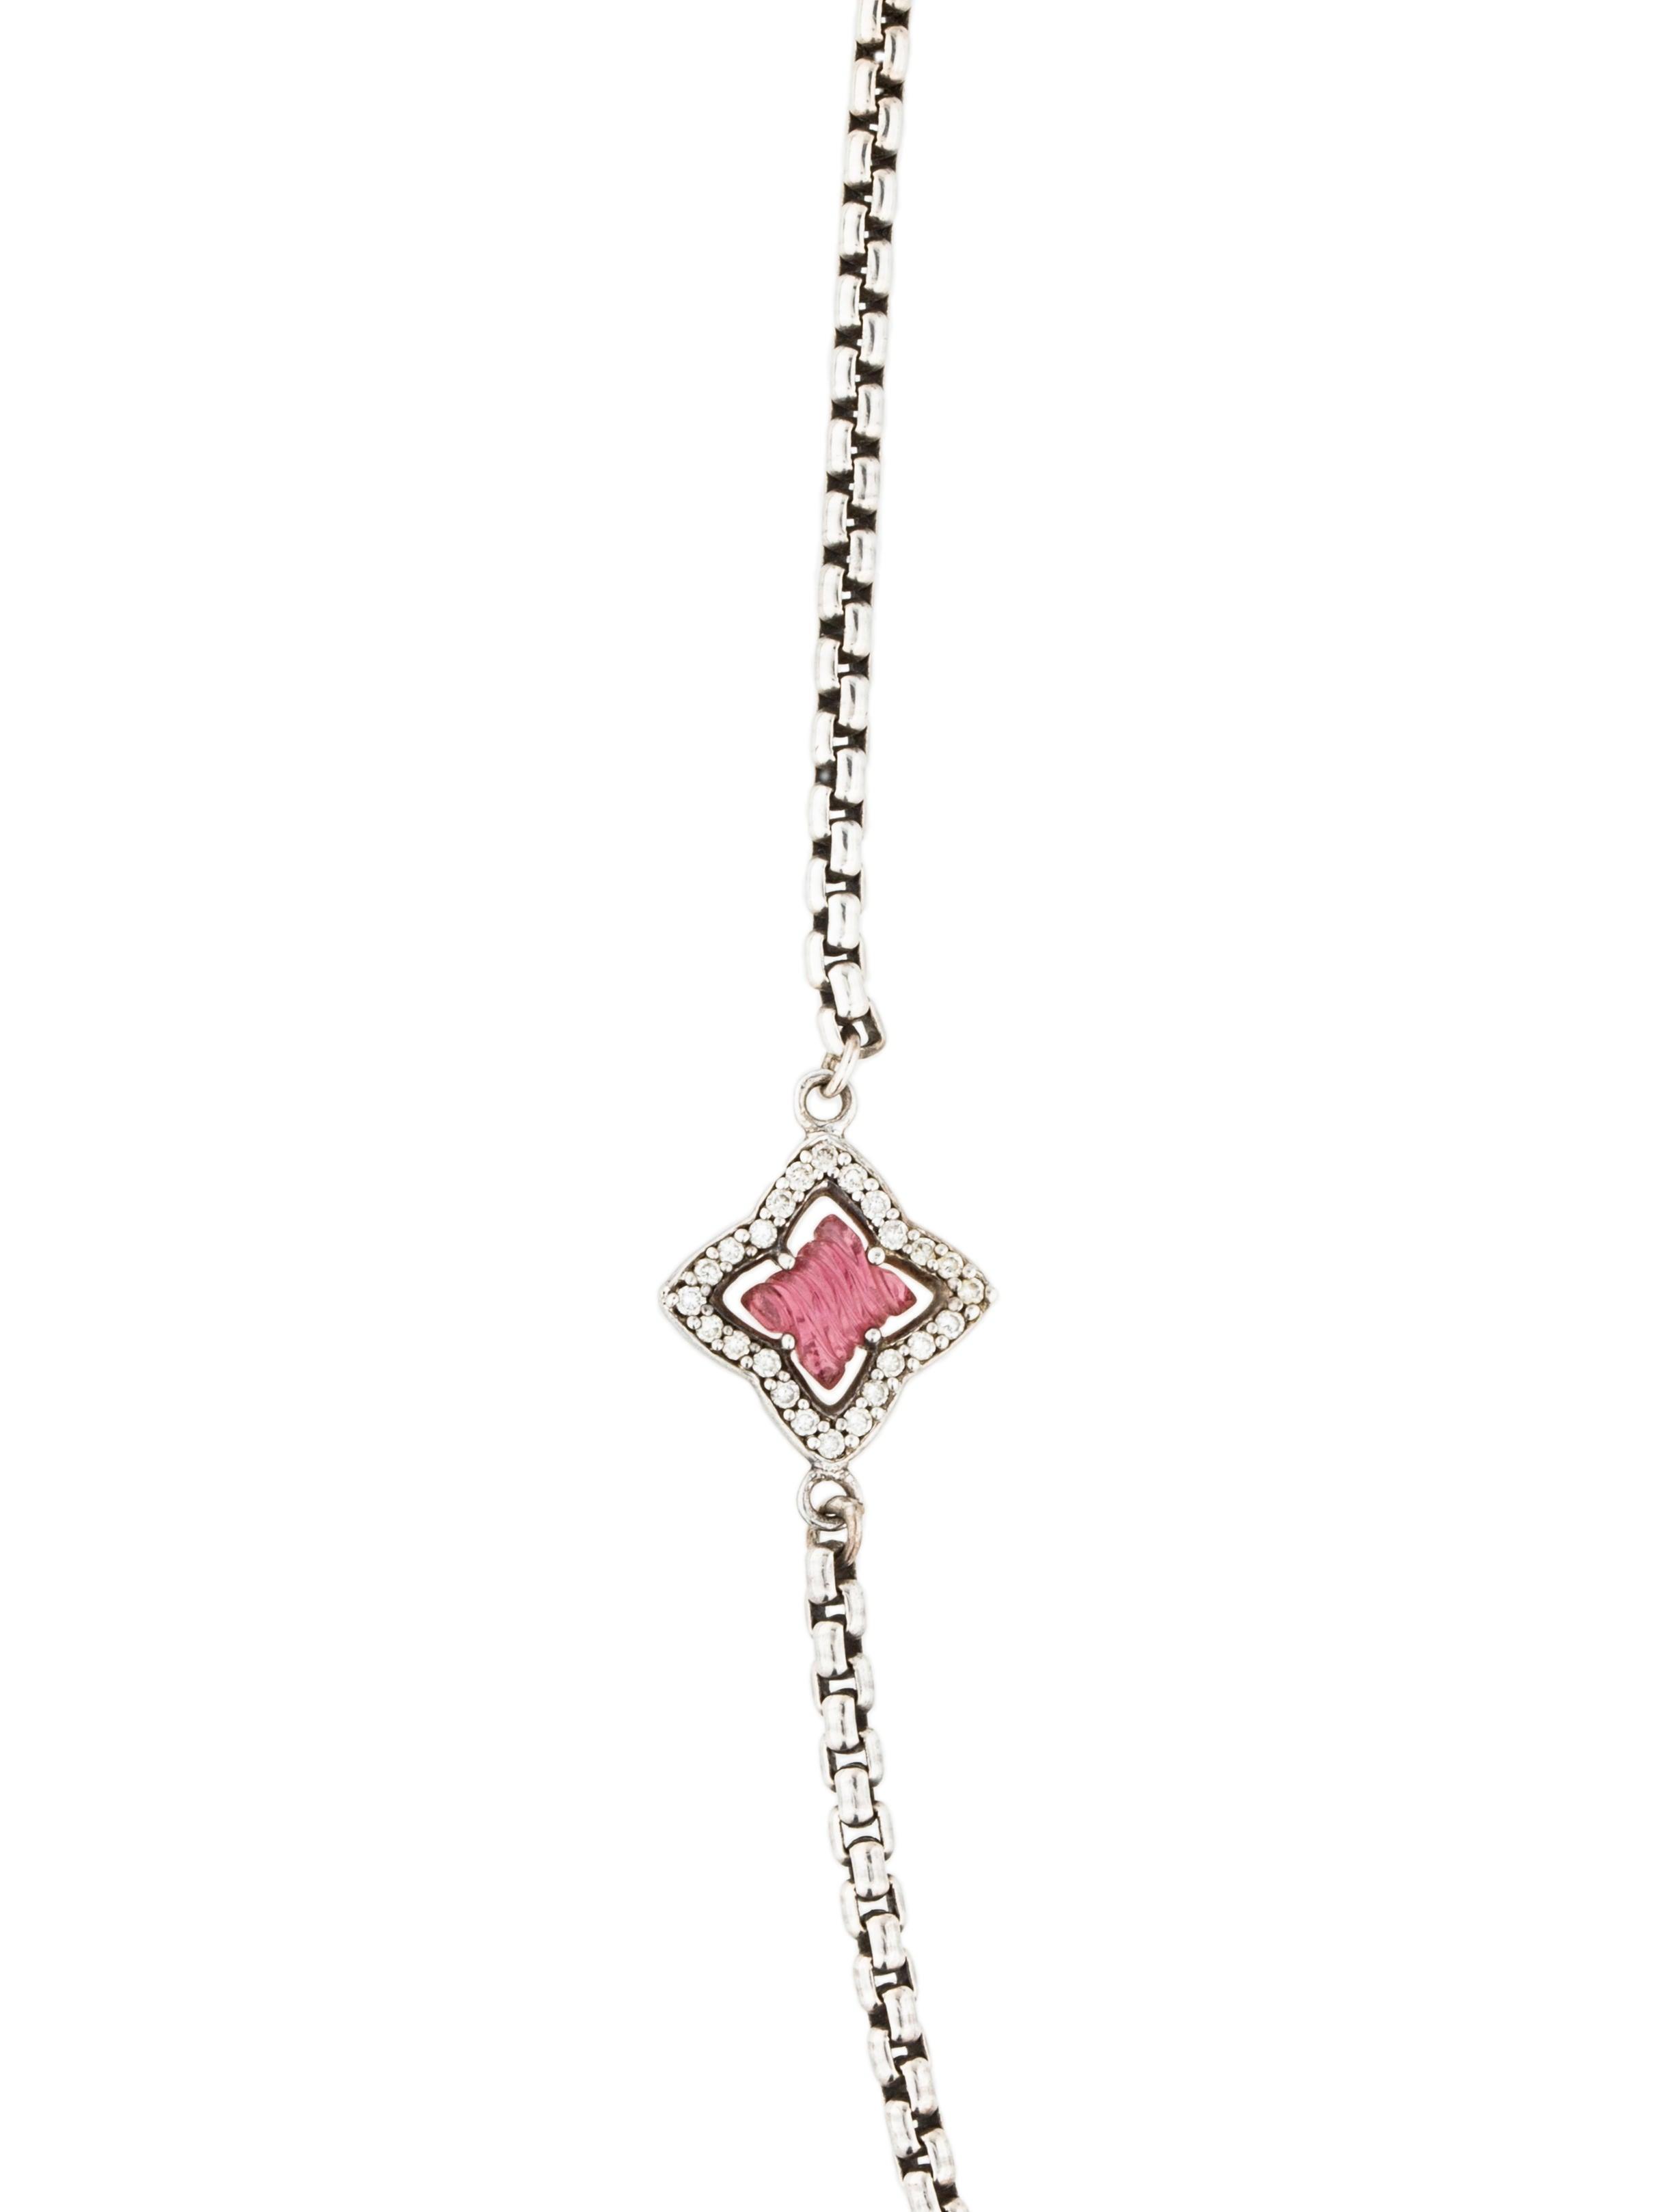 david yurman pink tourmaline diamond quatrefoil necklace. Black Bedroom Furniture Sets. Home Design Ideas